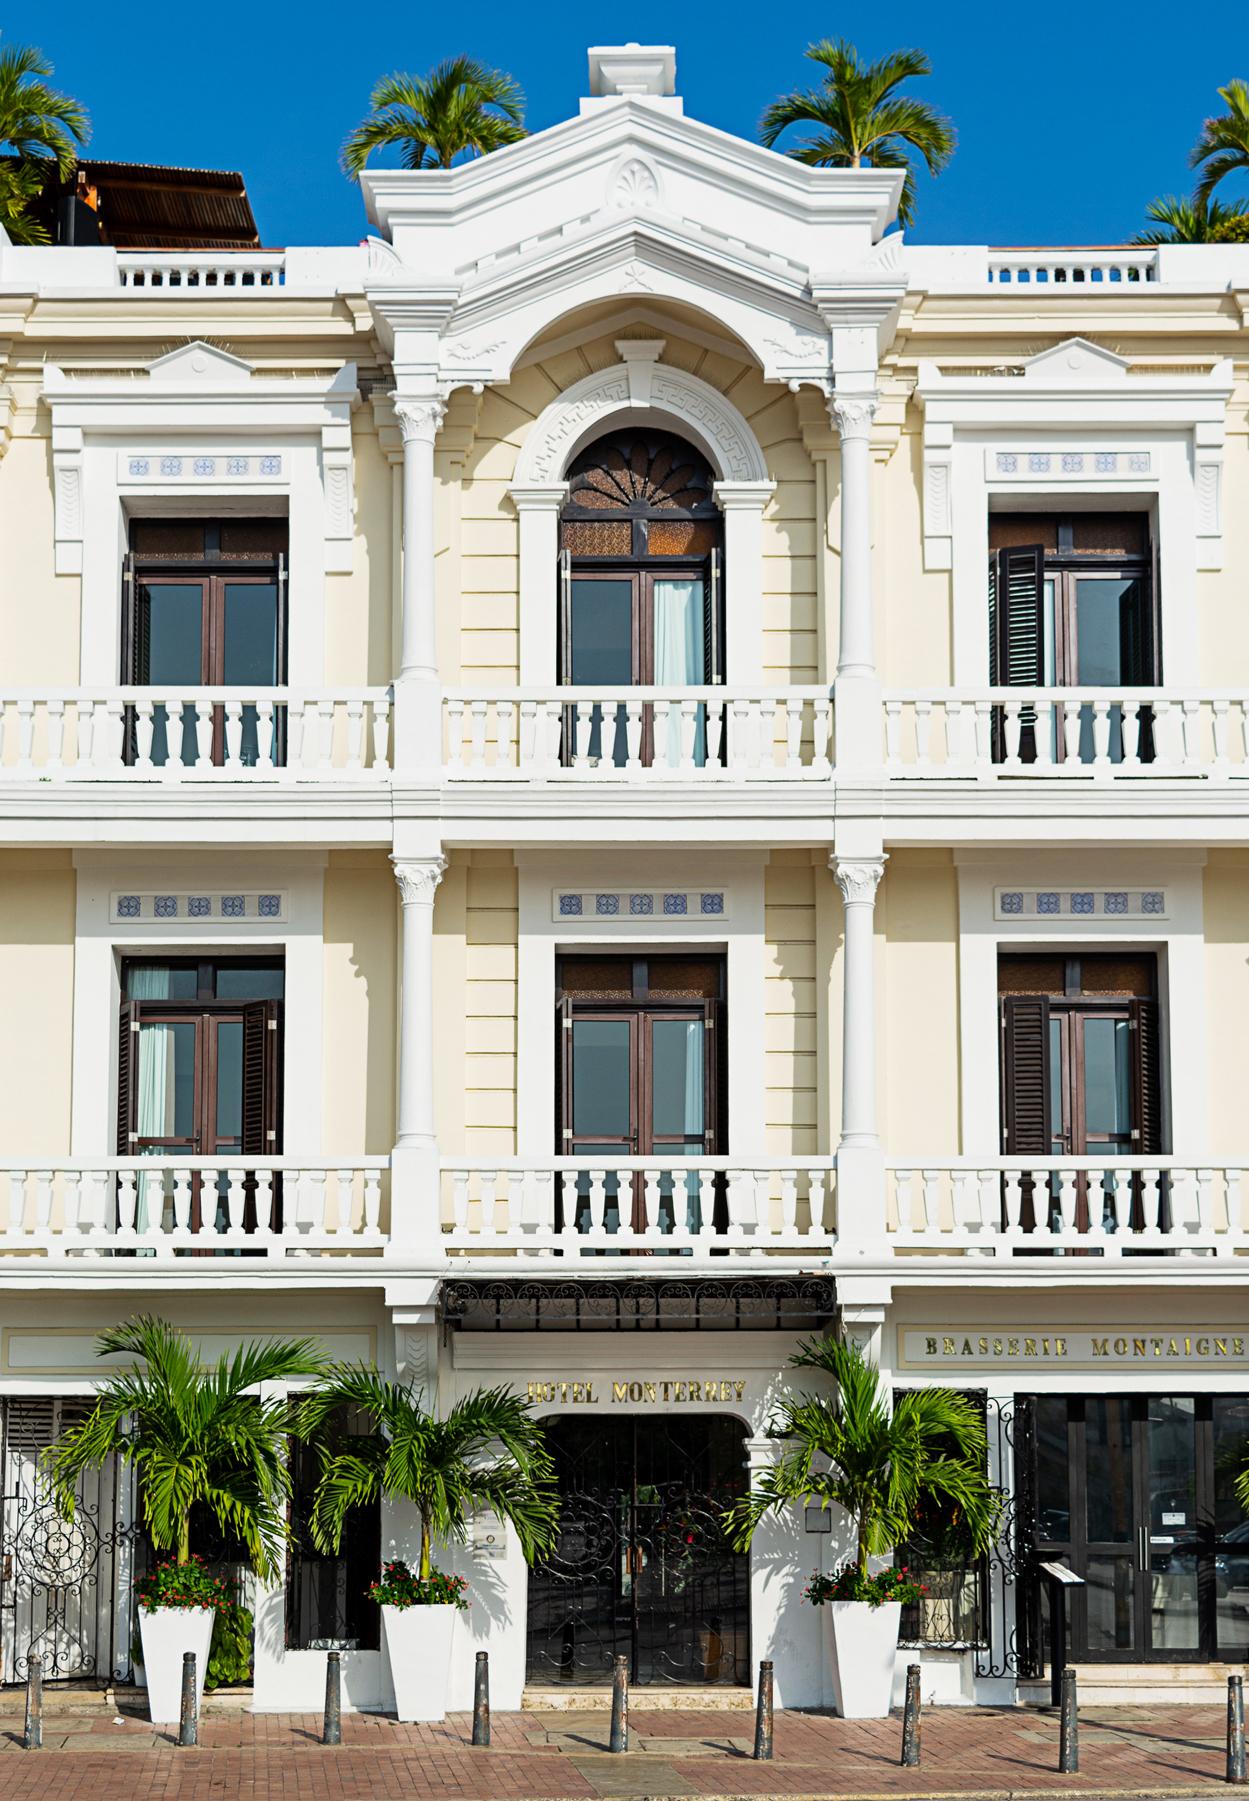 <center align>Hotel Monterrey</center align>